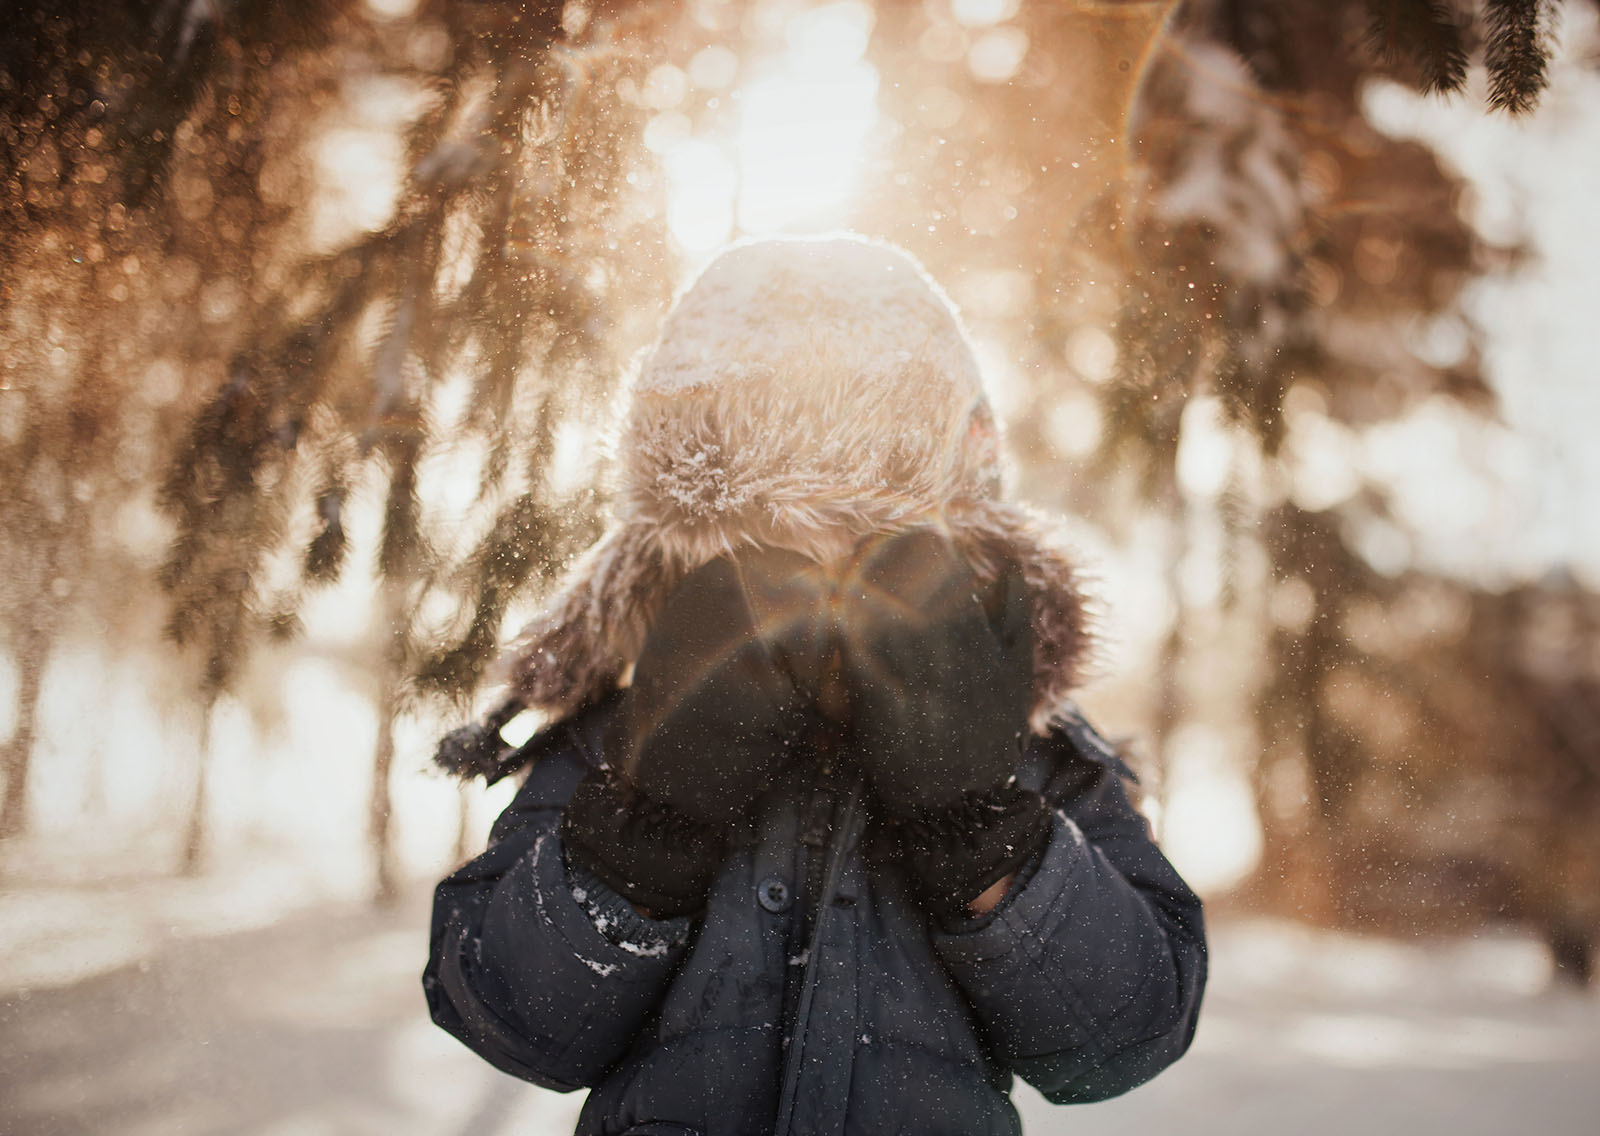 backlit pic of snow falling on boy by Meg Loeks